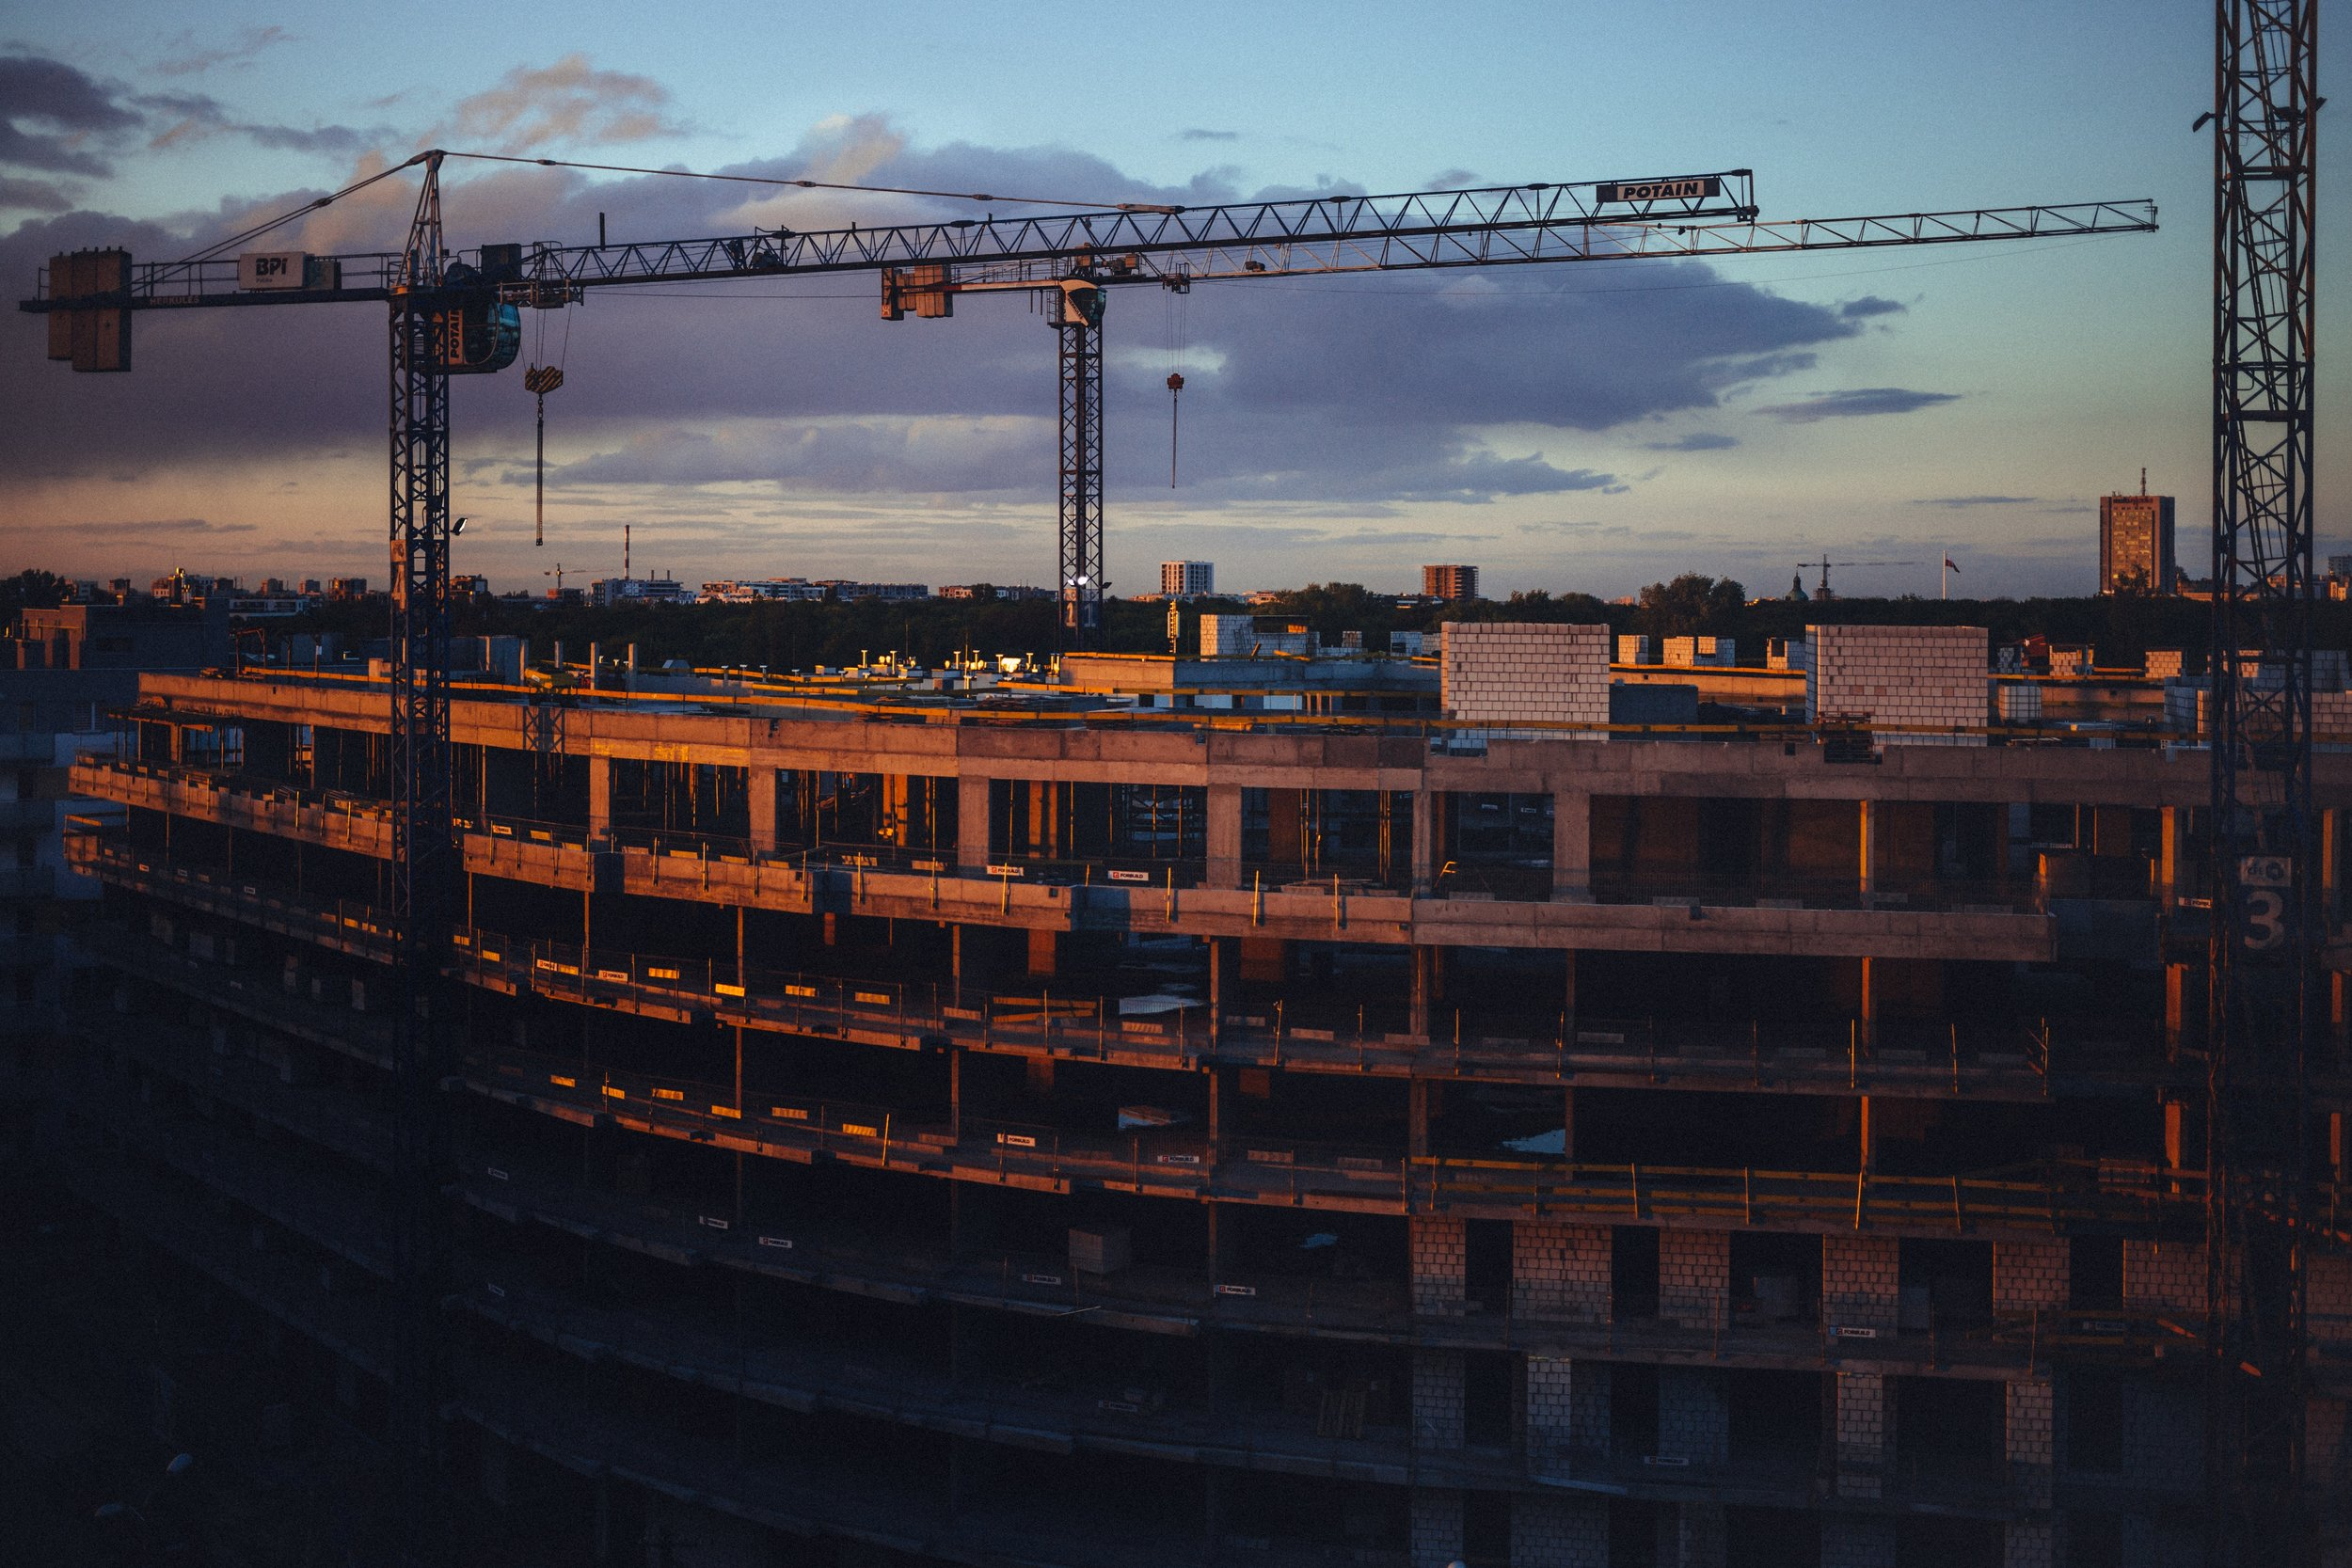 architecture-building-city-410730.jpg